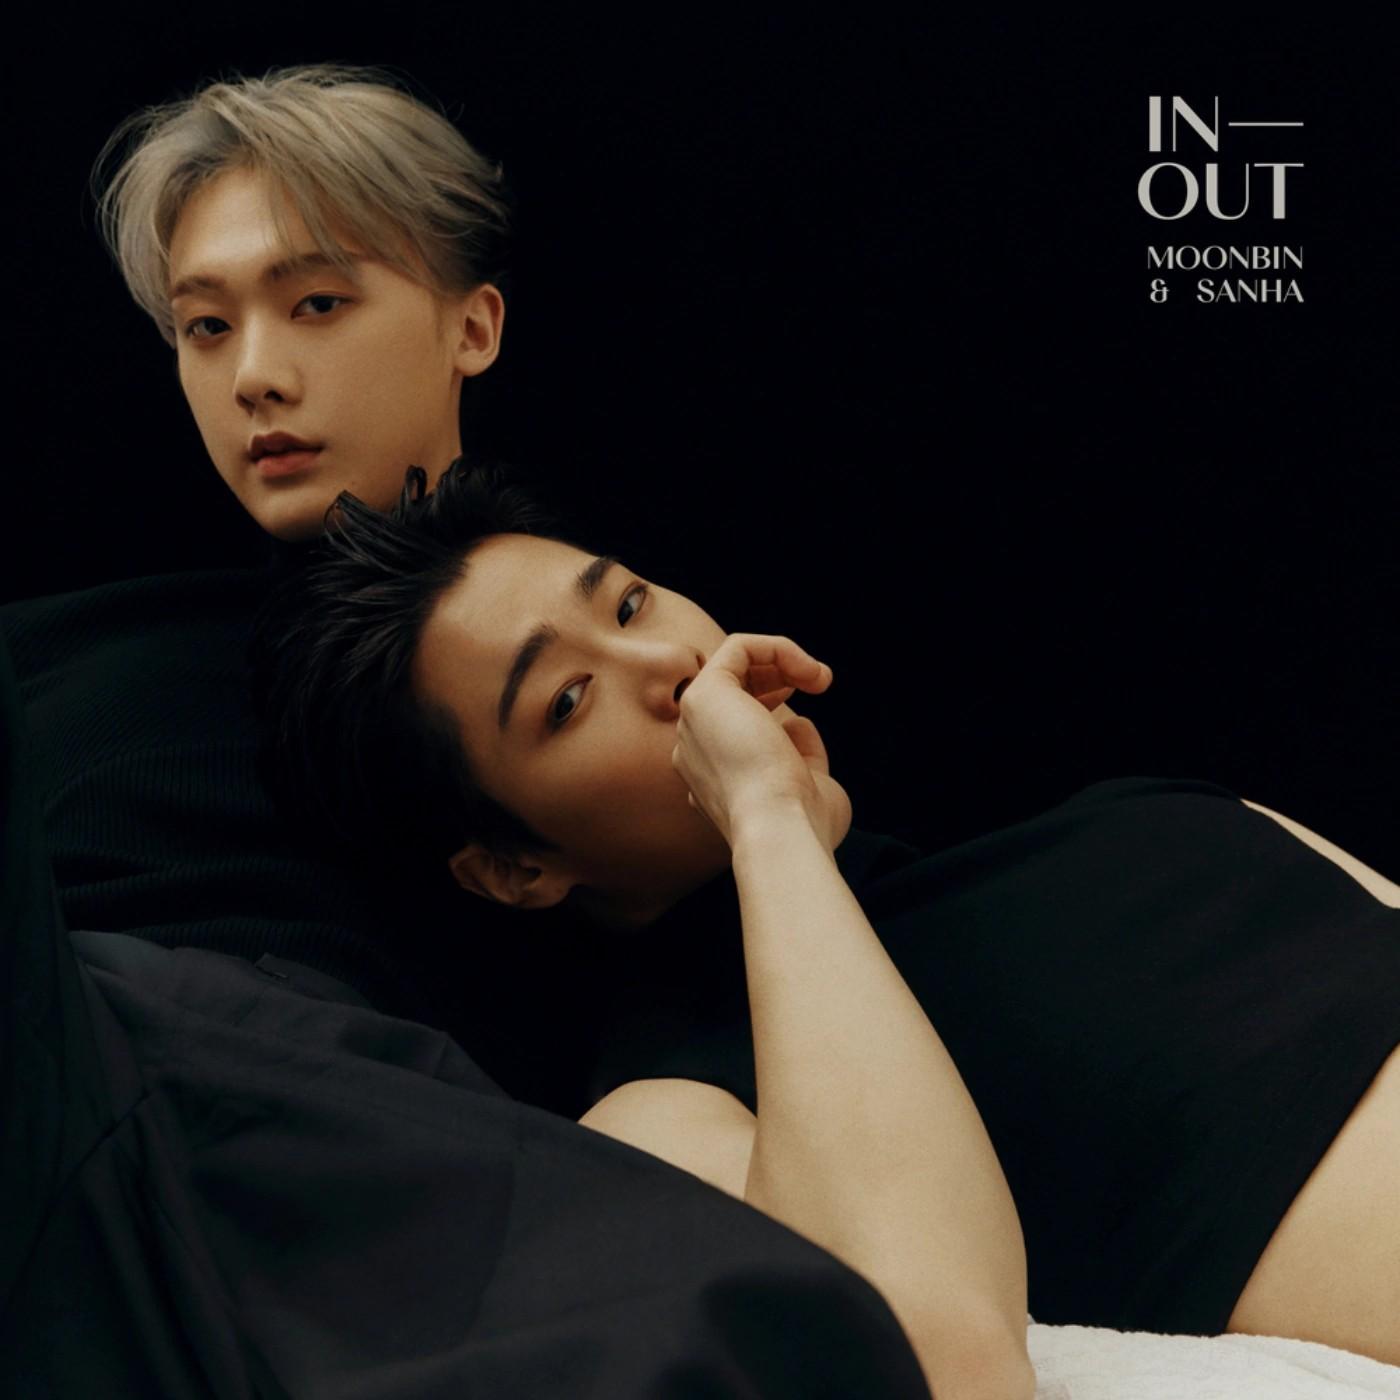 ASTRO – Moonbin & Sanha (아스트로 – 문빈&산하) – In-Out [FLAC / WEB] [2020.09.14]